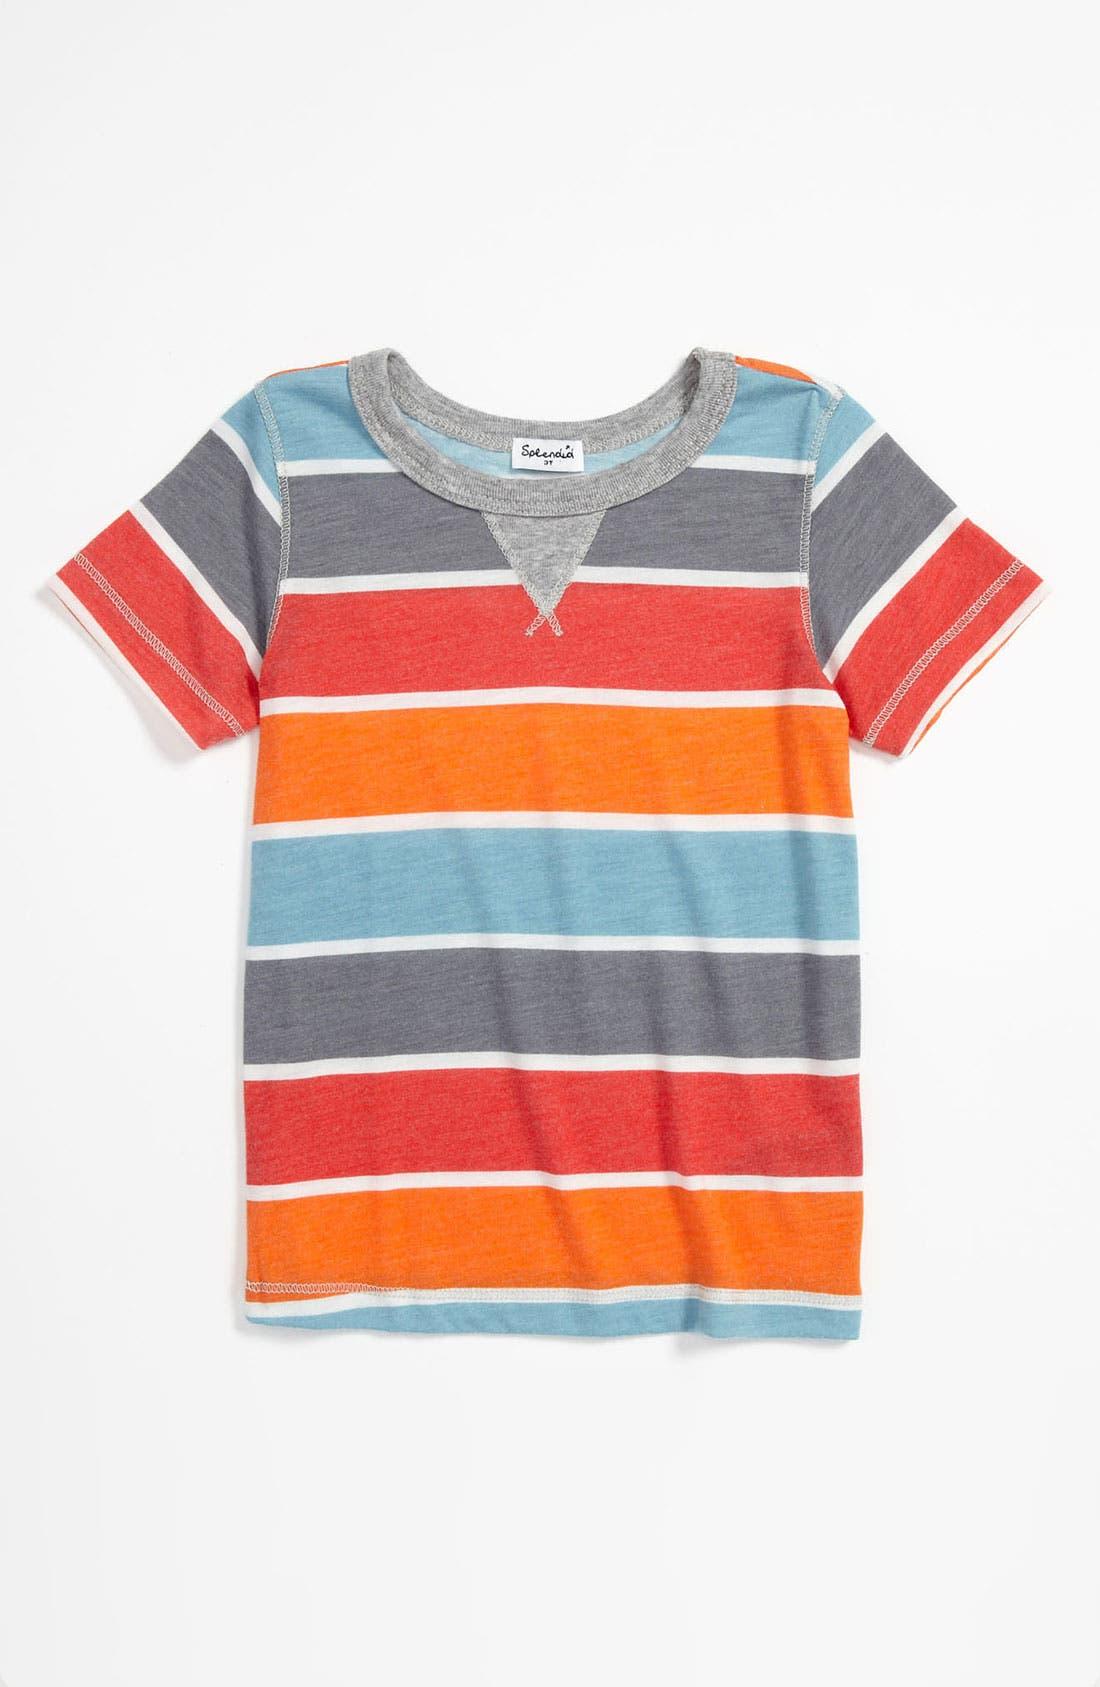 Main Image - Splendid Stripe T-Shirt (Toddler)